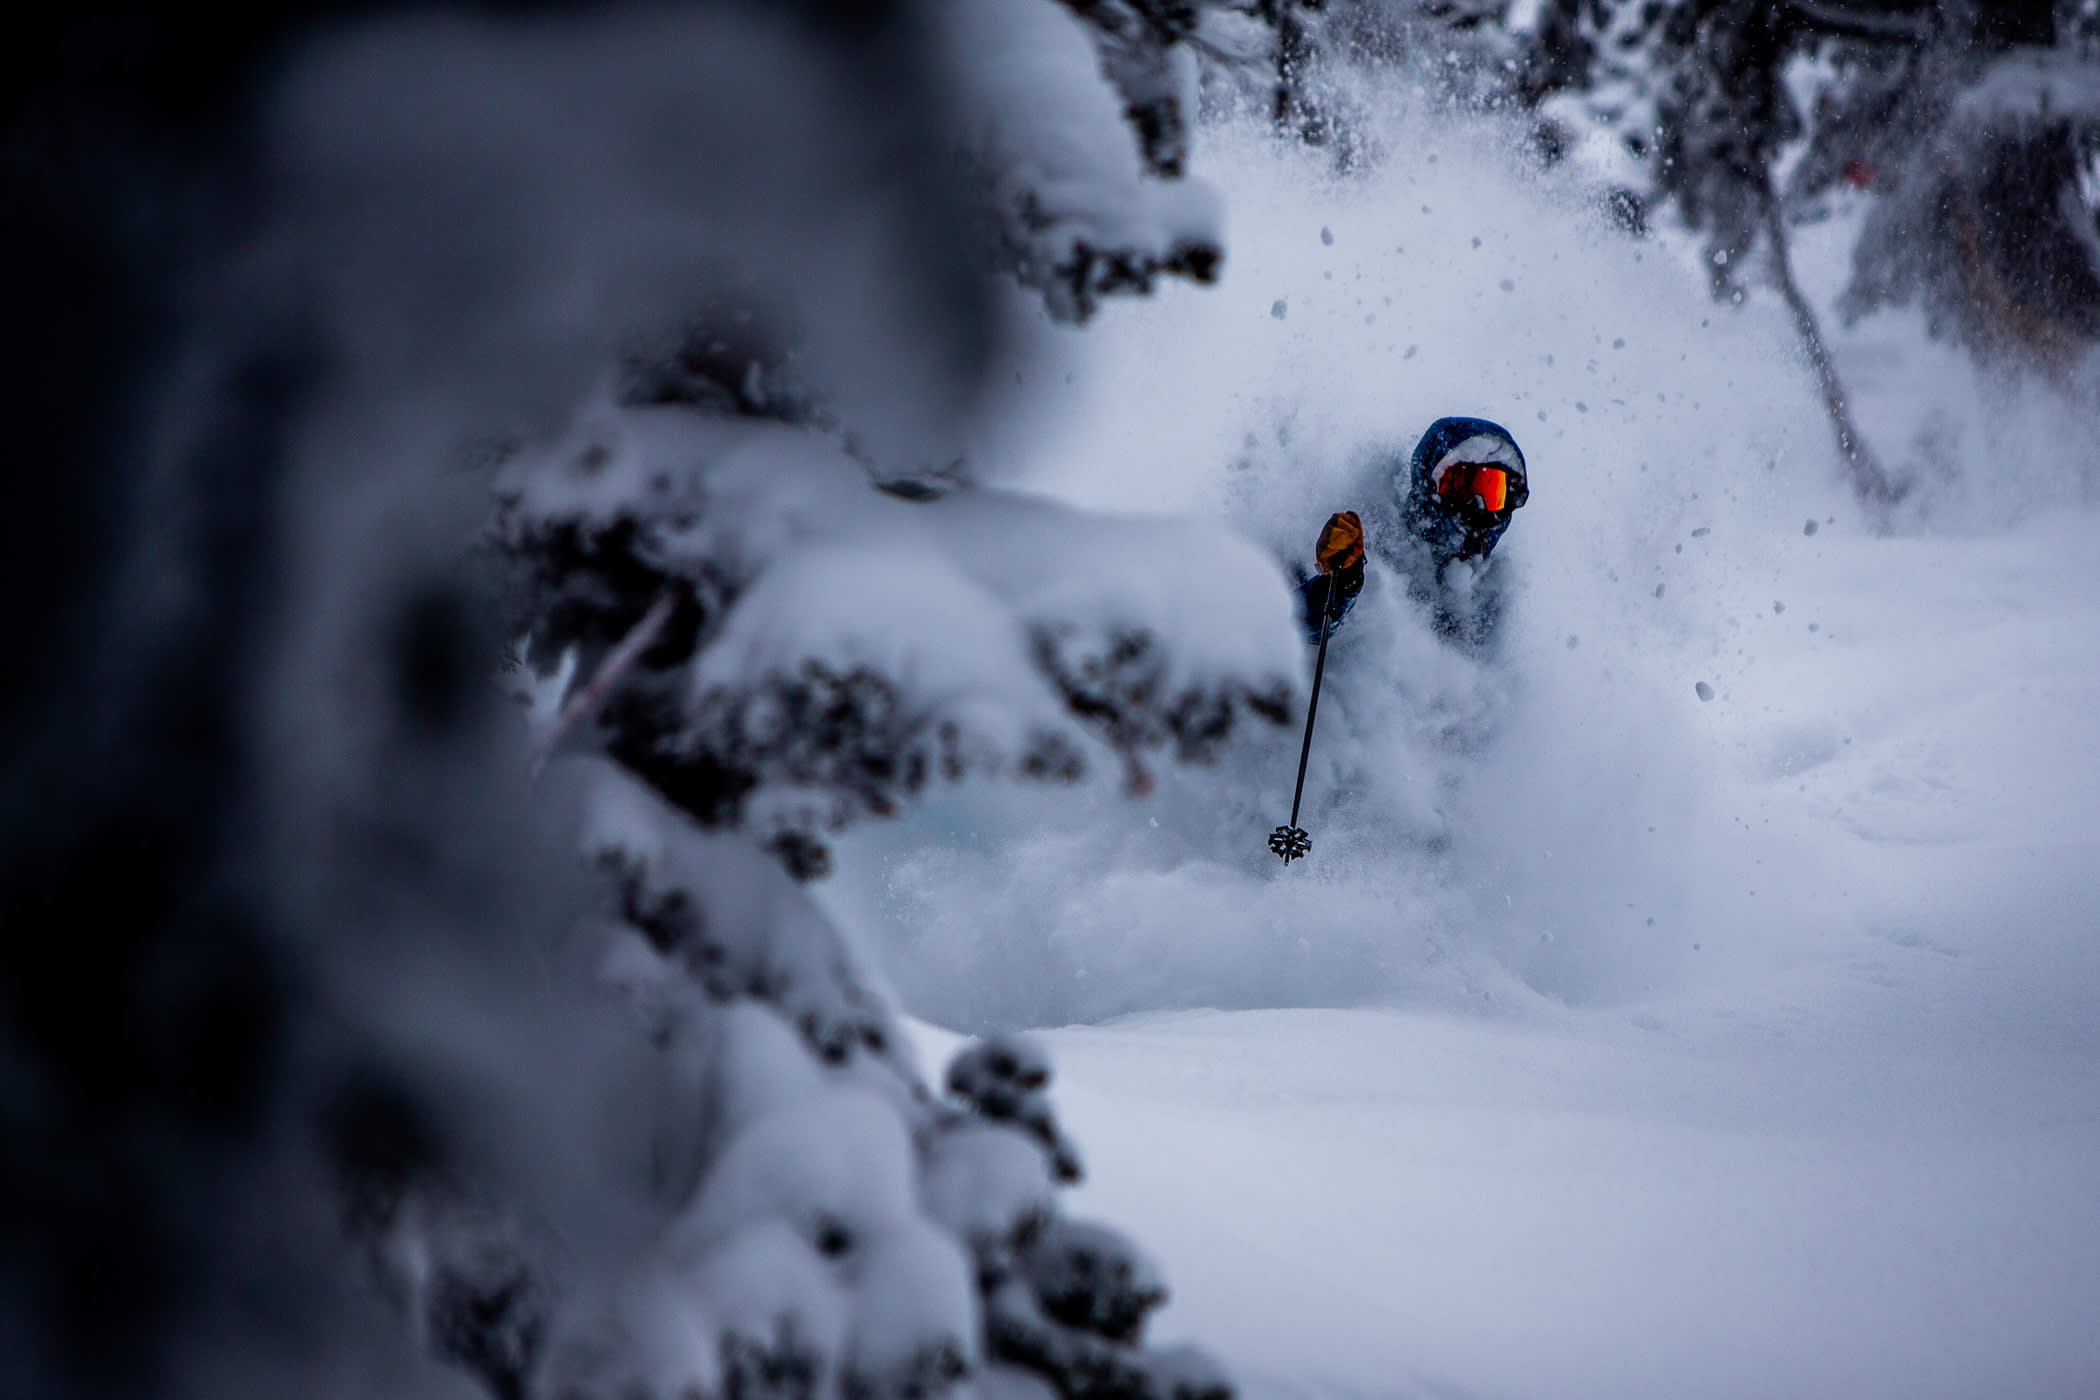 Jonah Williams loves powder skiing   Photo: Rocko Menzyk